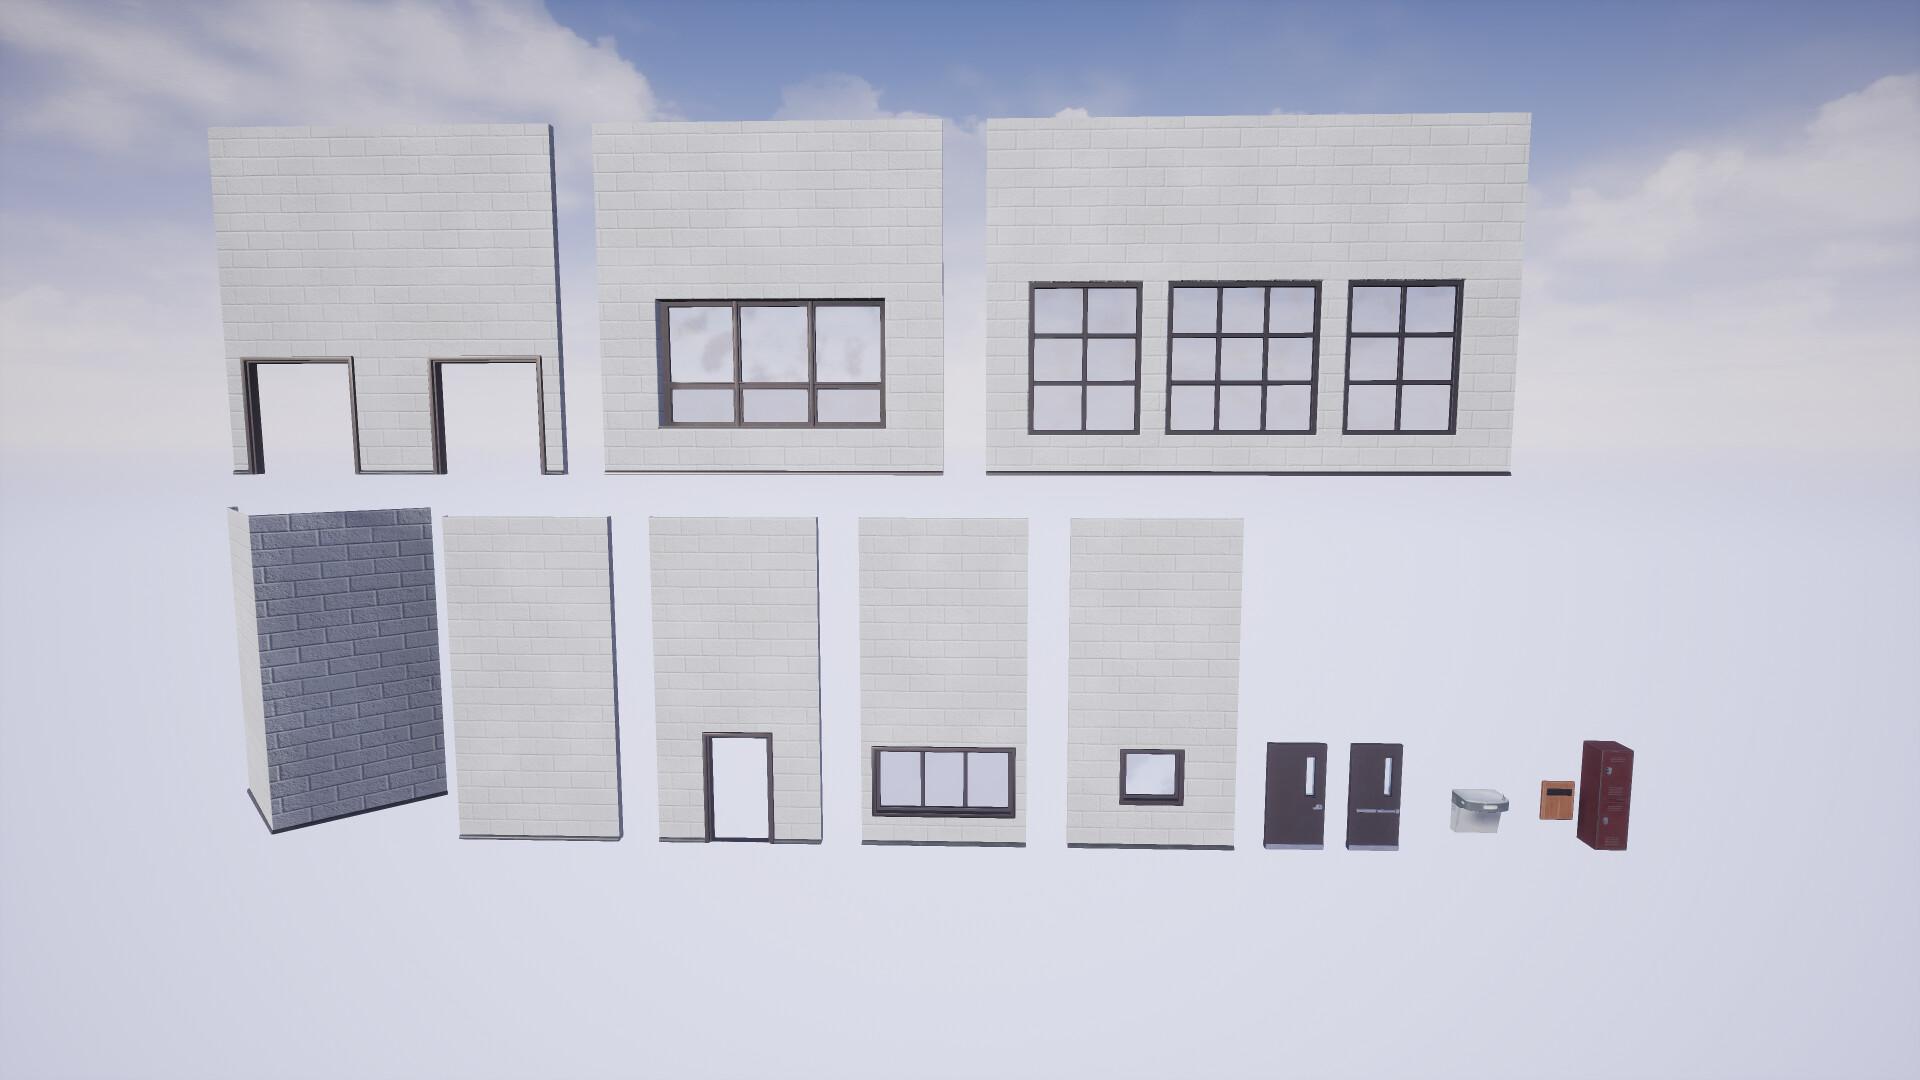 Some modular assets